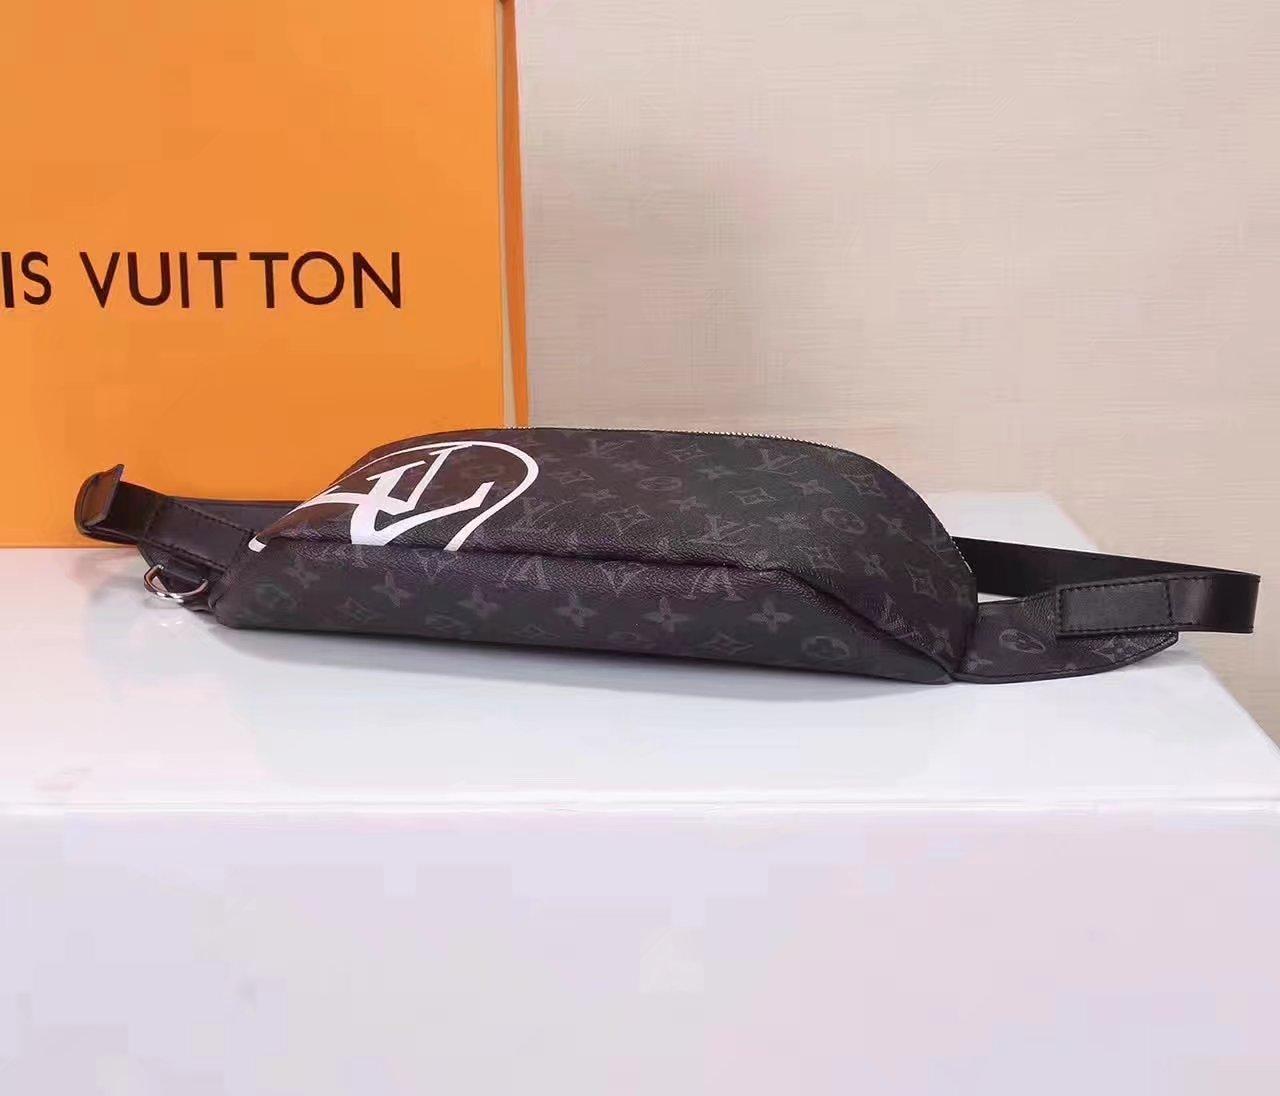 louis vuitton m54319 supreme messenger bag. Black Bedroom Furniture Sets. Home Design Ideas